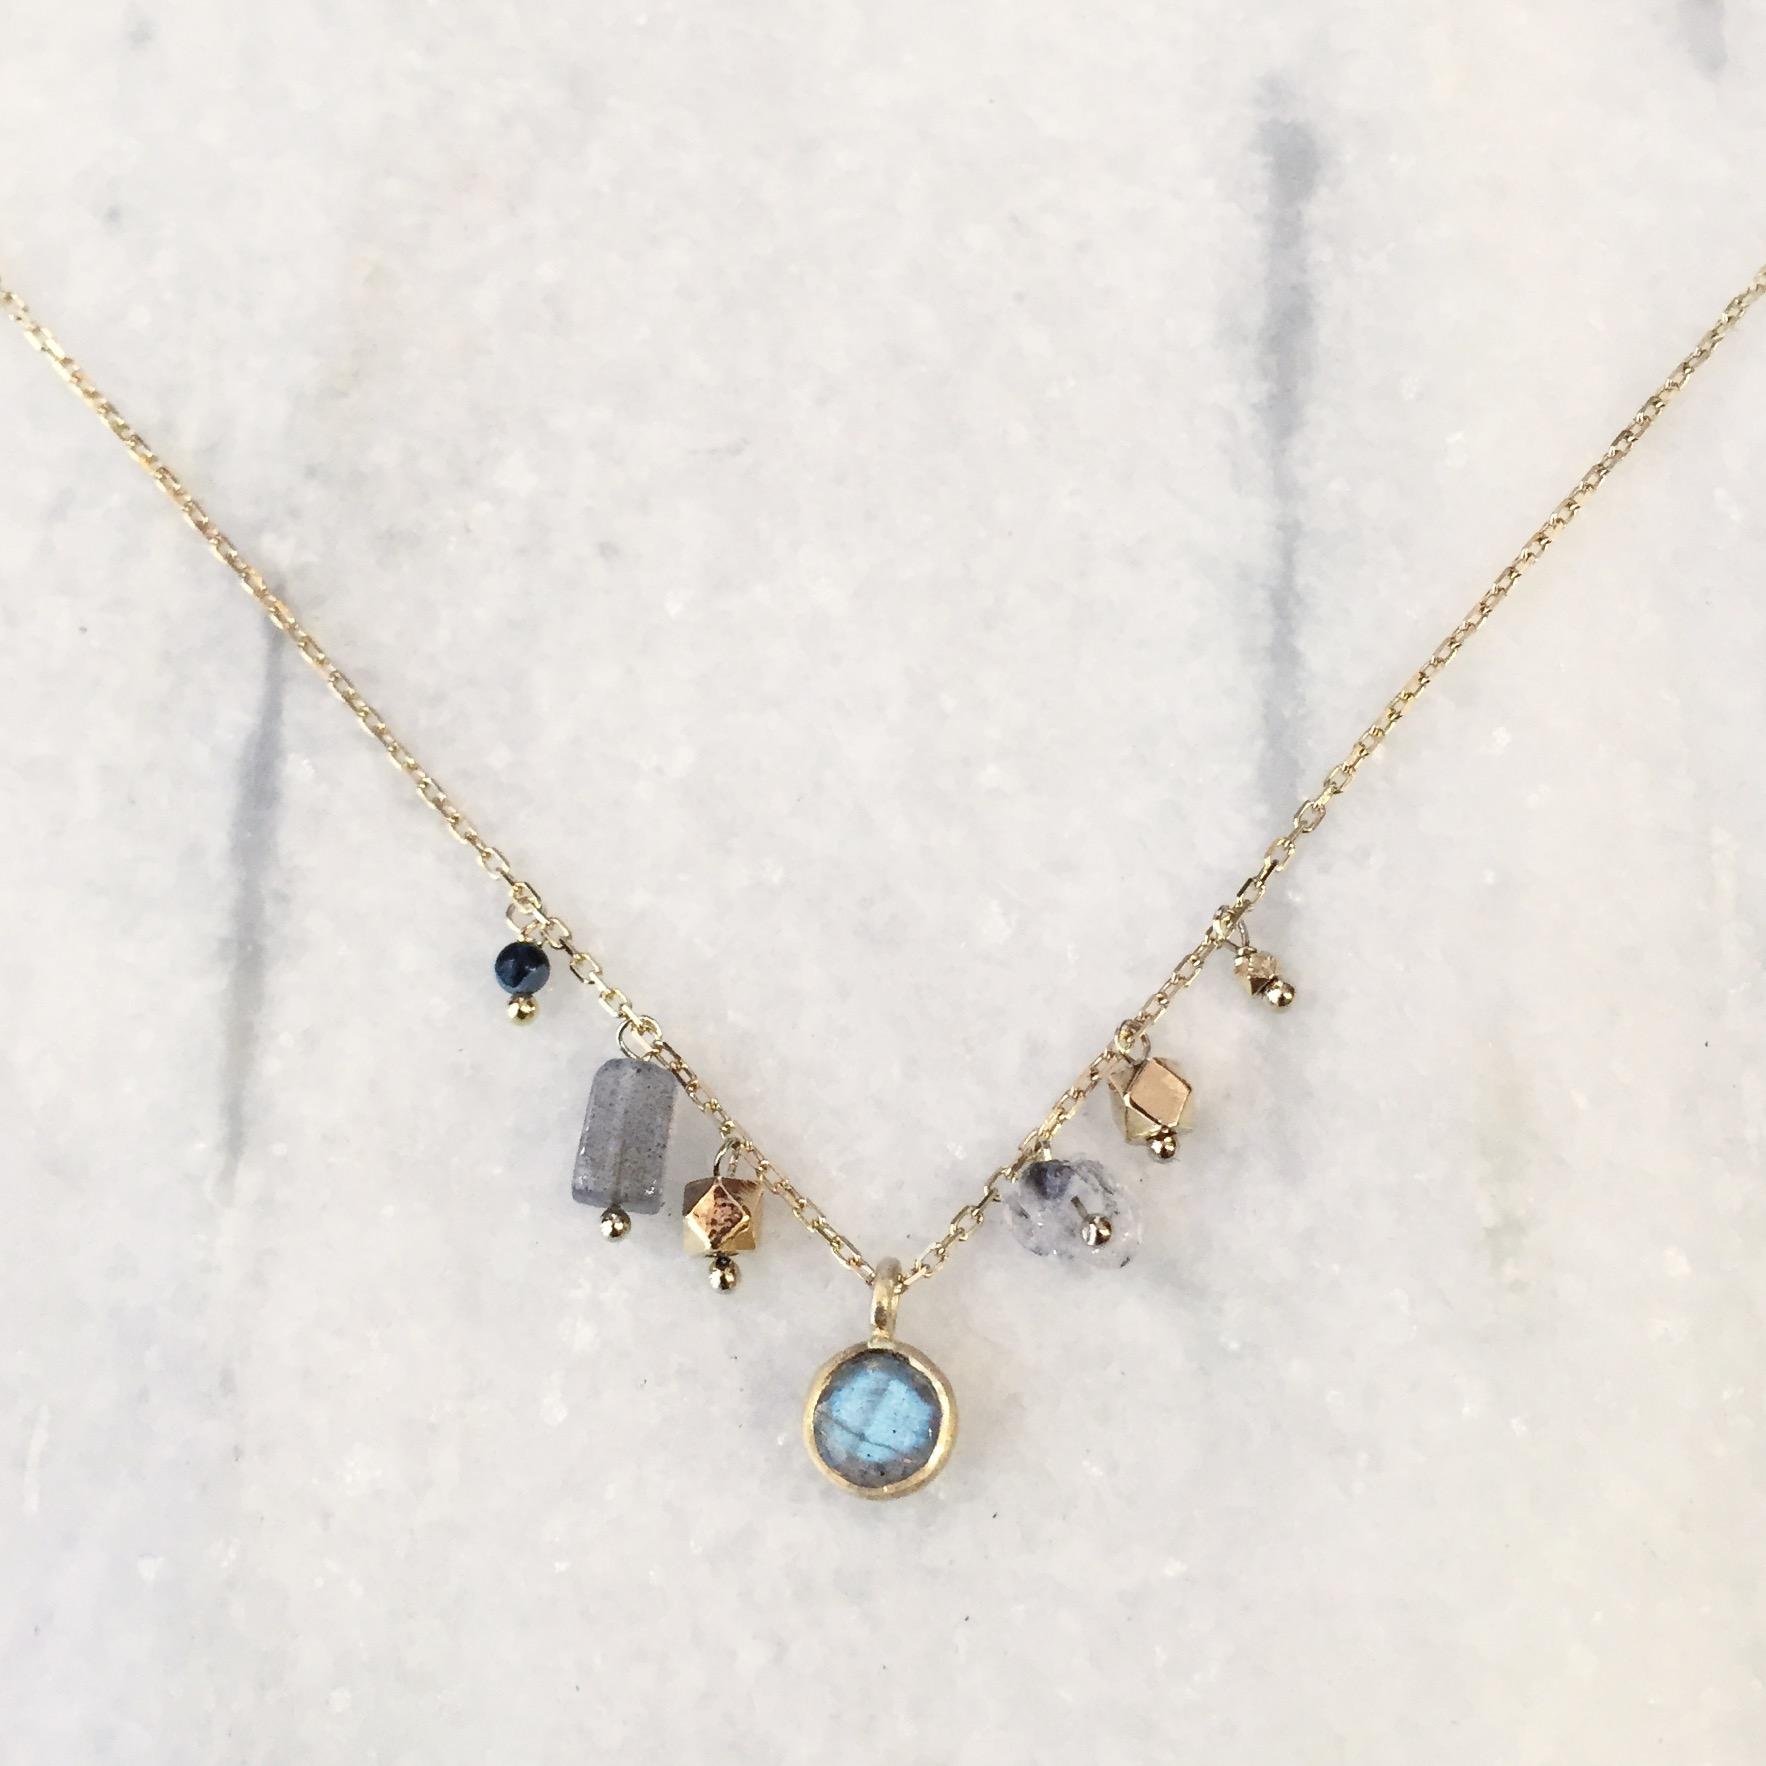 Labradorite Jewellery Silver Plated 925 Sterling Necklace Handmade Labradorite Gemstone Necklace Gemstone Jewellery